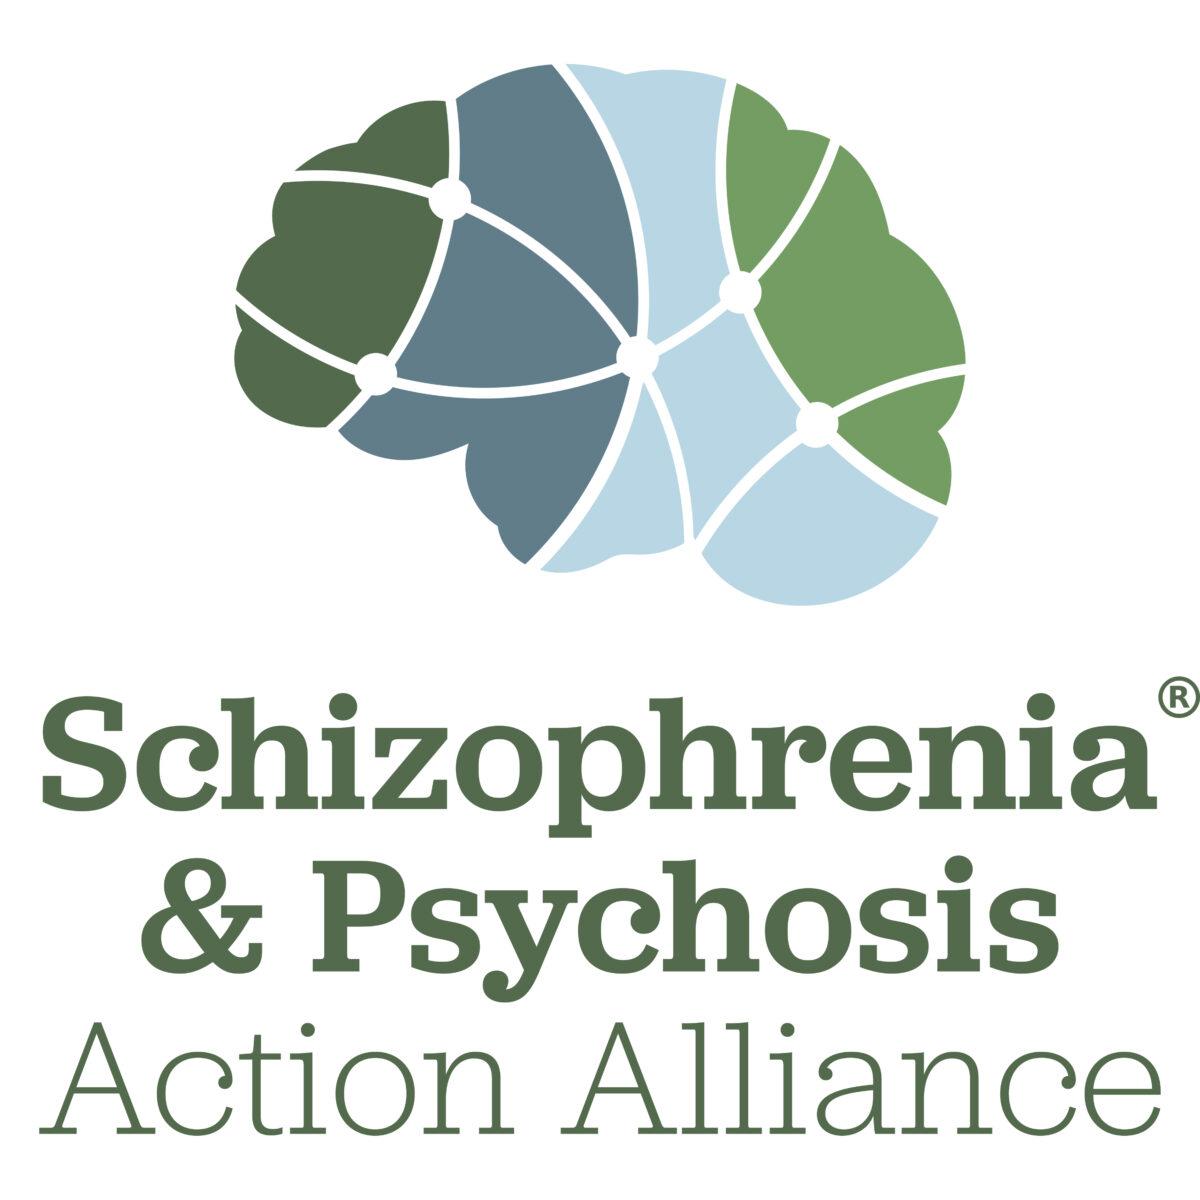 The Schizophrenia & Psychosis Action Alliance